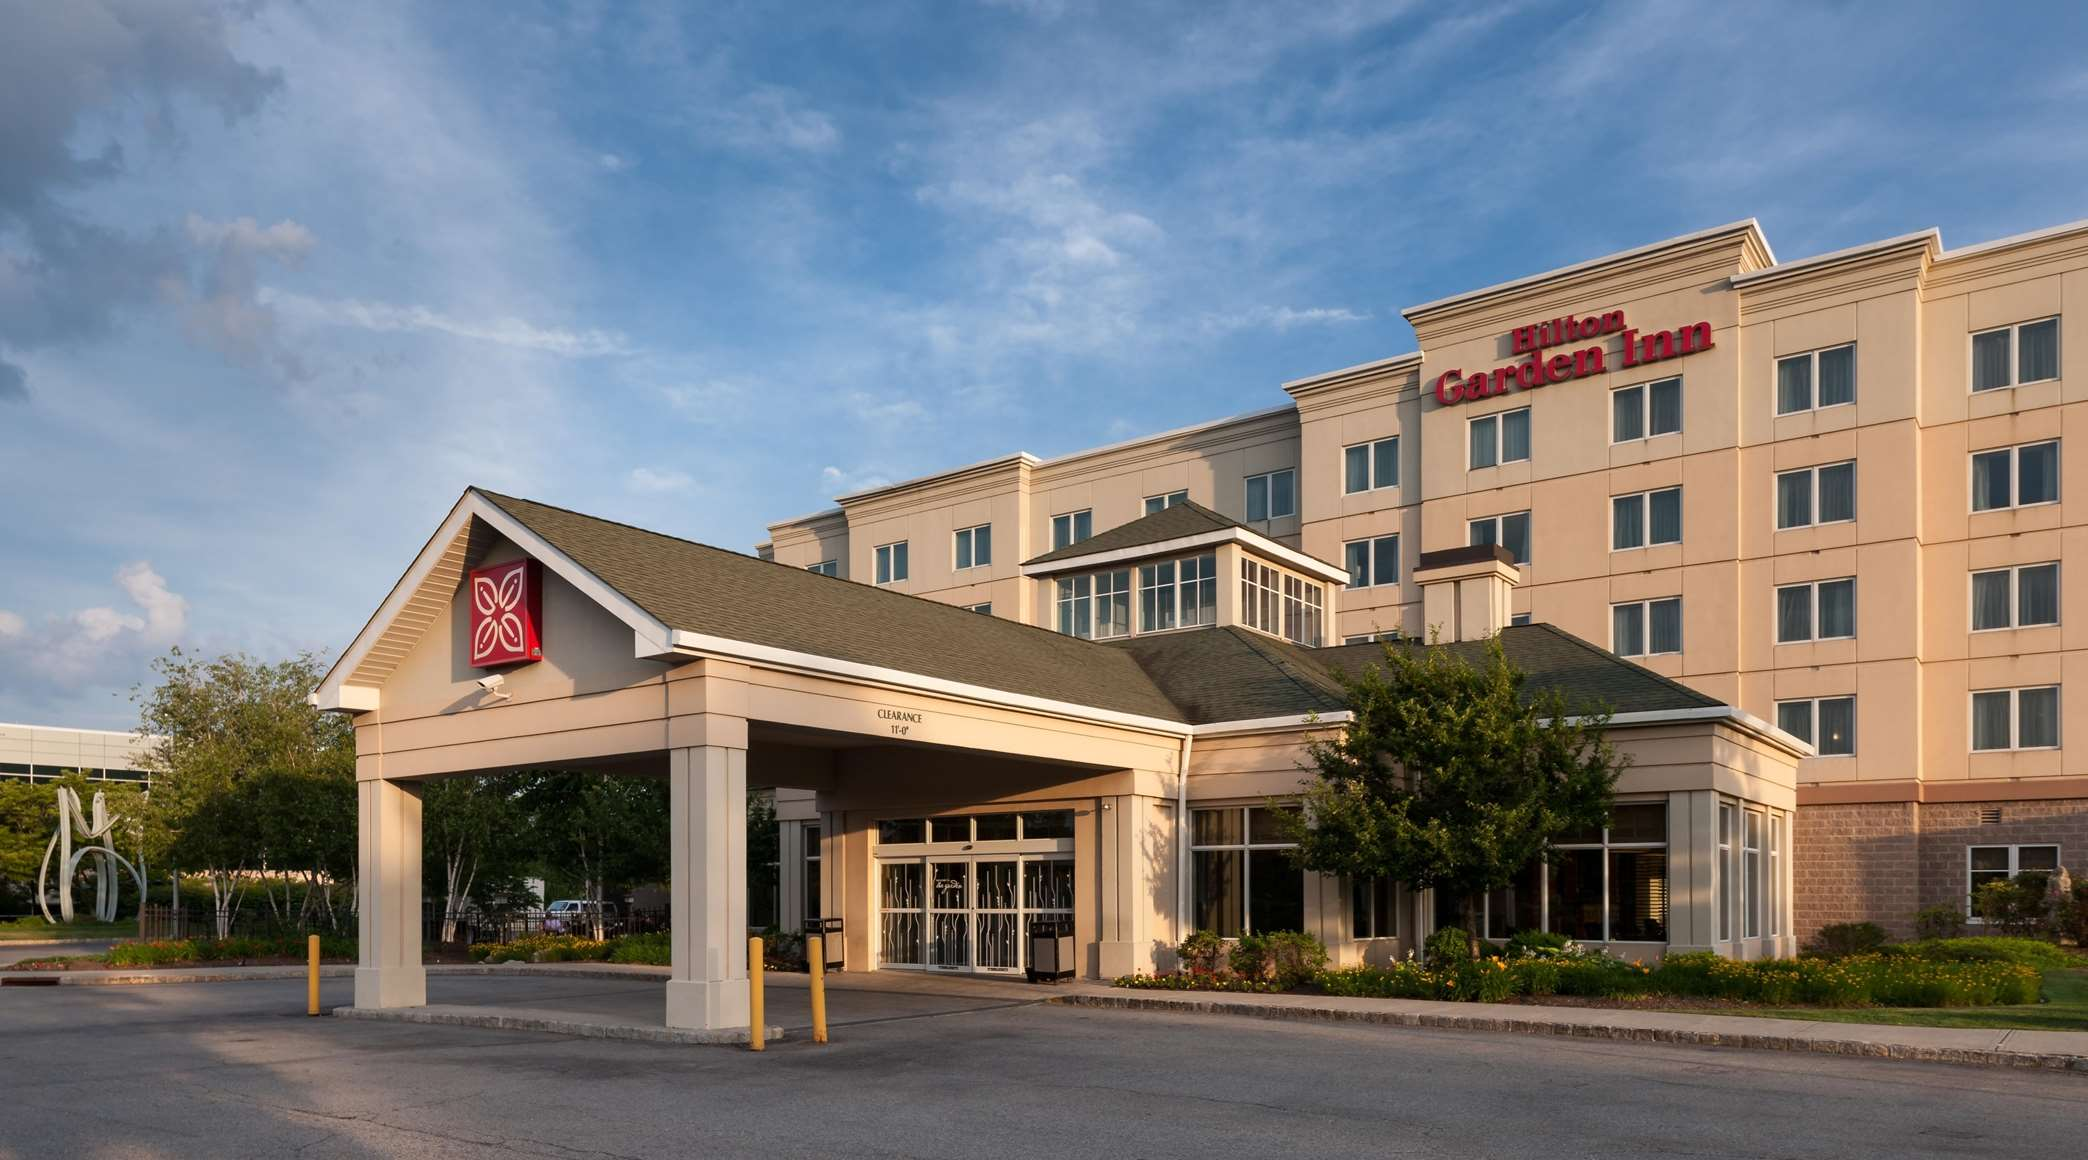 Hilton Garden Inn Rockaway image 29